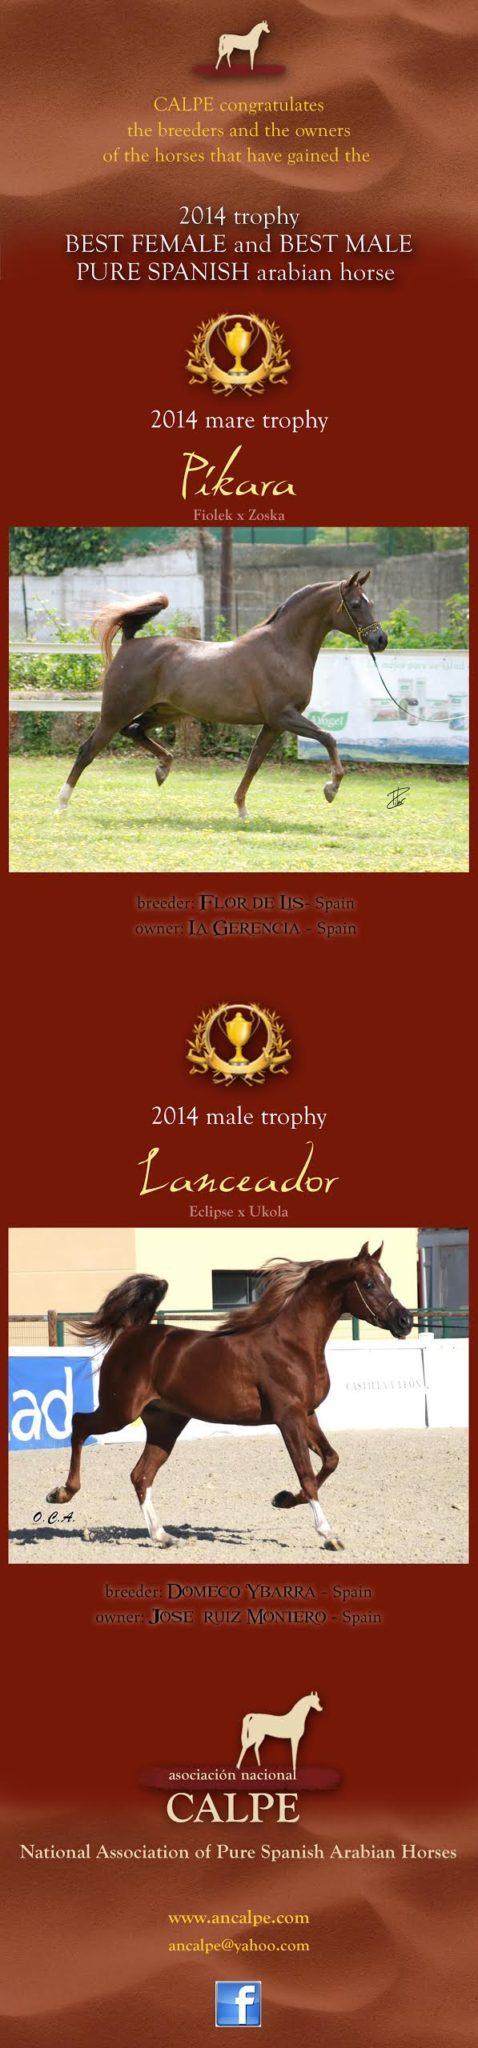 Trofeo CALPE a los mejores Pure Spanish arabian horse